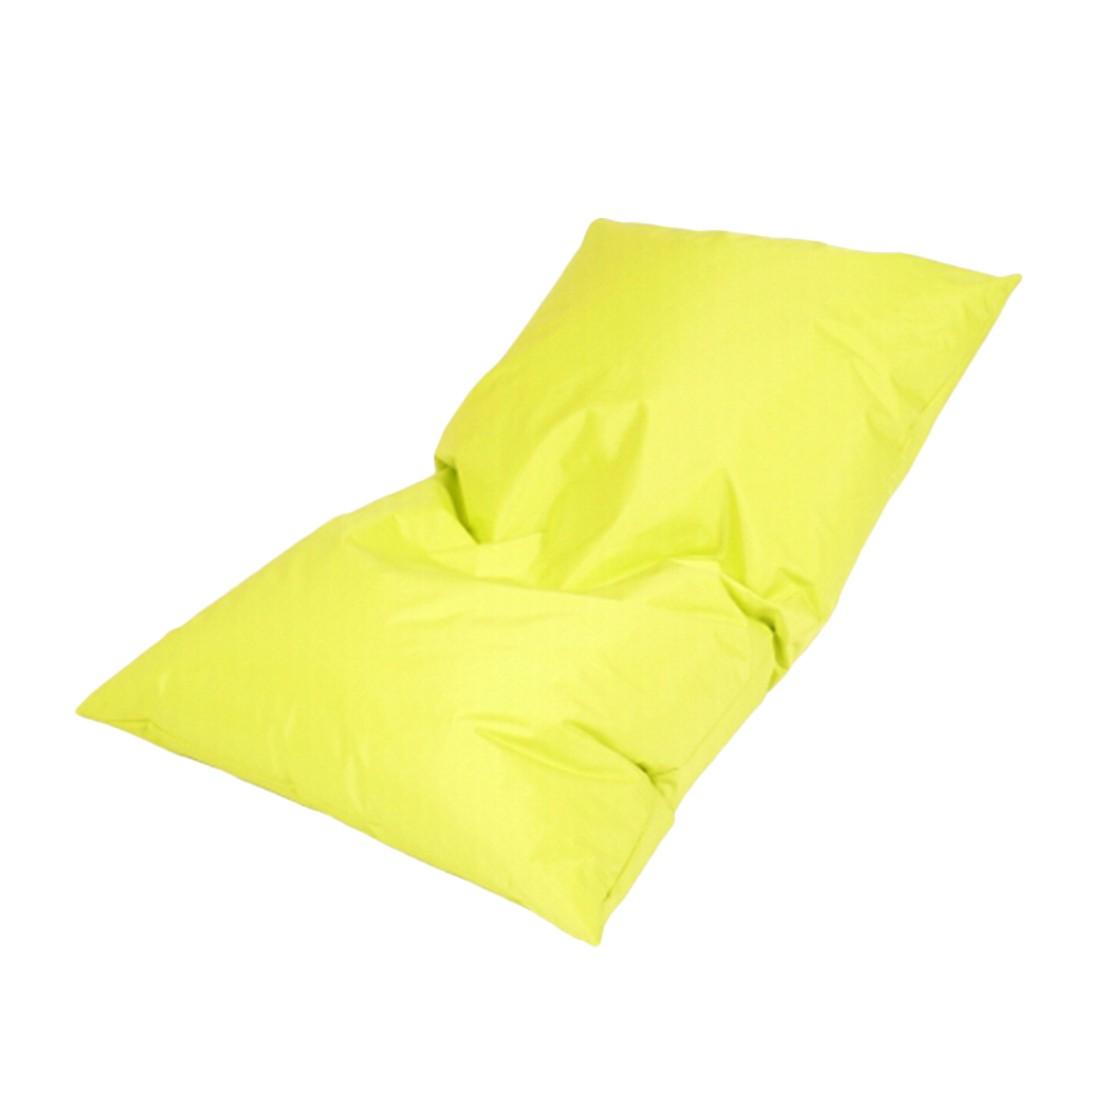 Relaxkissen Nylon Gelb groß – 130 x 80 cm, KC-Handel günstig bestellen